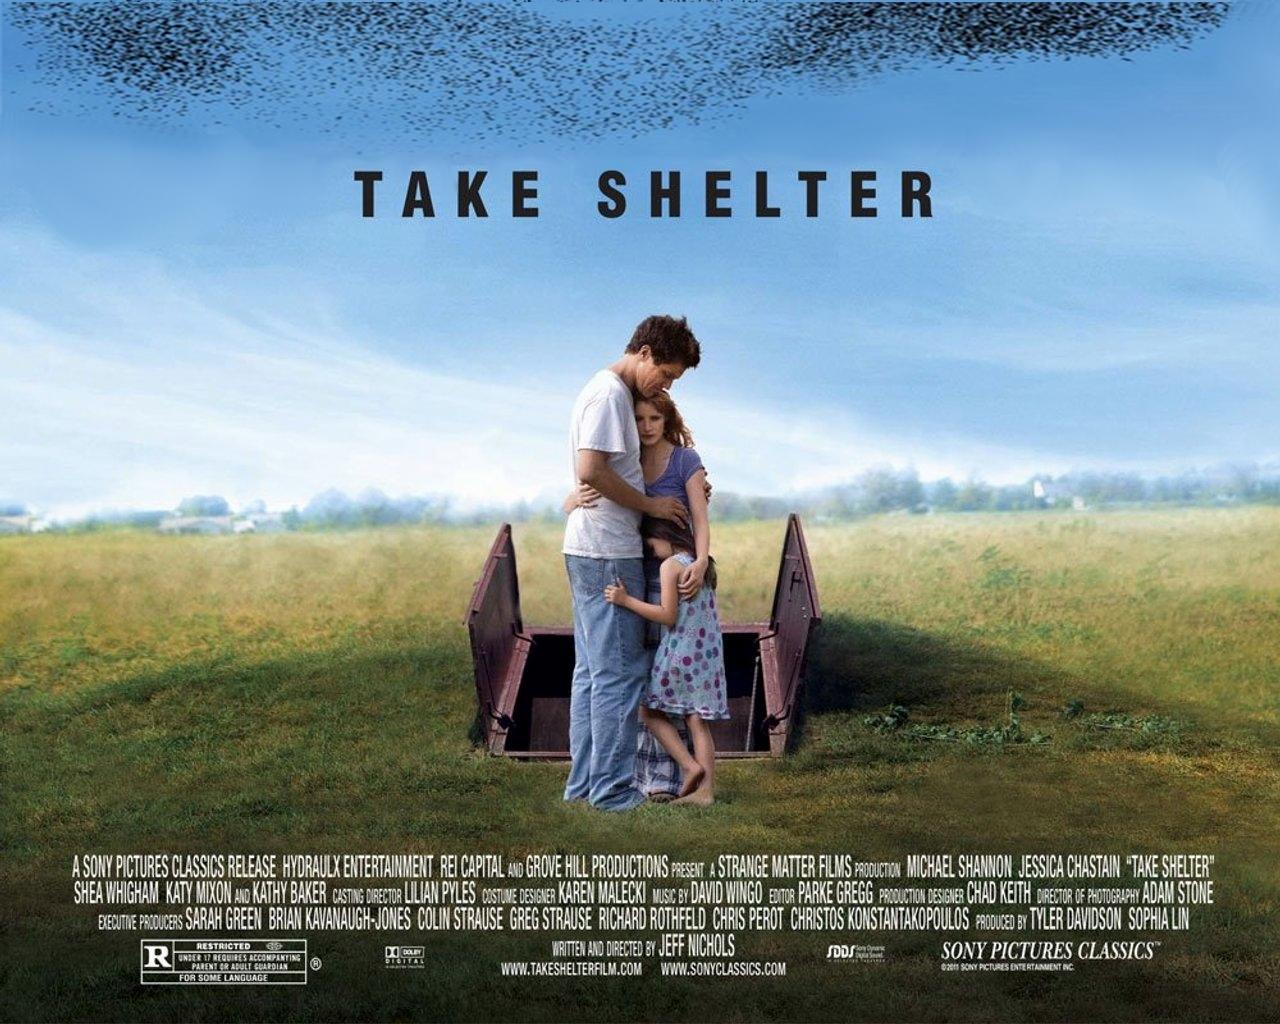 http://4.bp.blogspot.com/-97xbky6EJOg/T2eaVDn3CgI/AAAAAAAAAtk/nUit87GtOWs/s1600/Take+Shelter+Poster+1.jpg